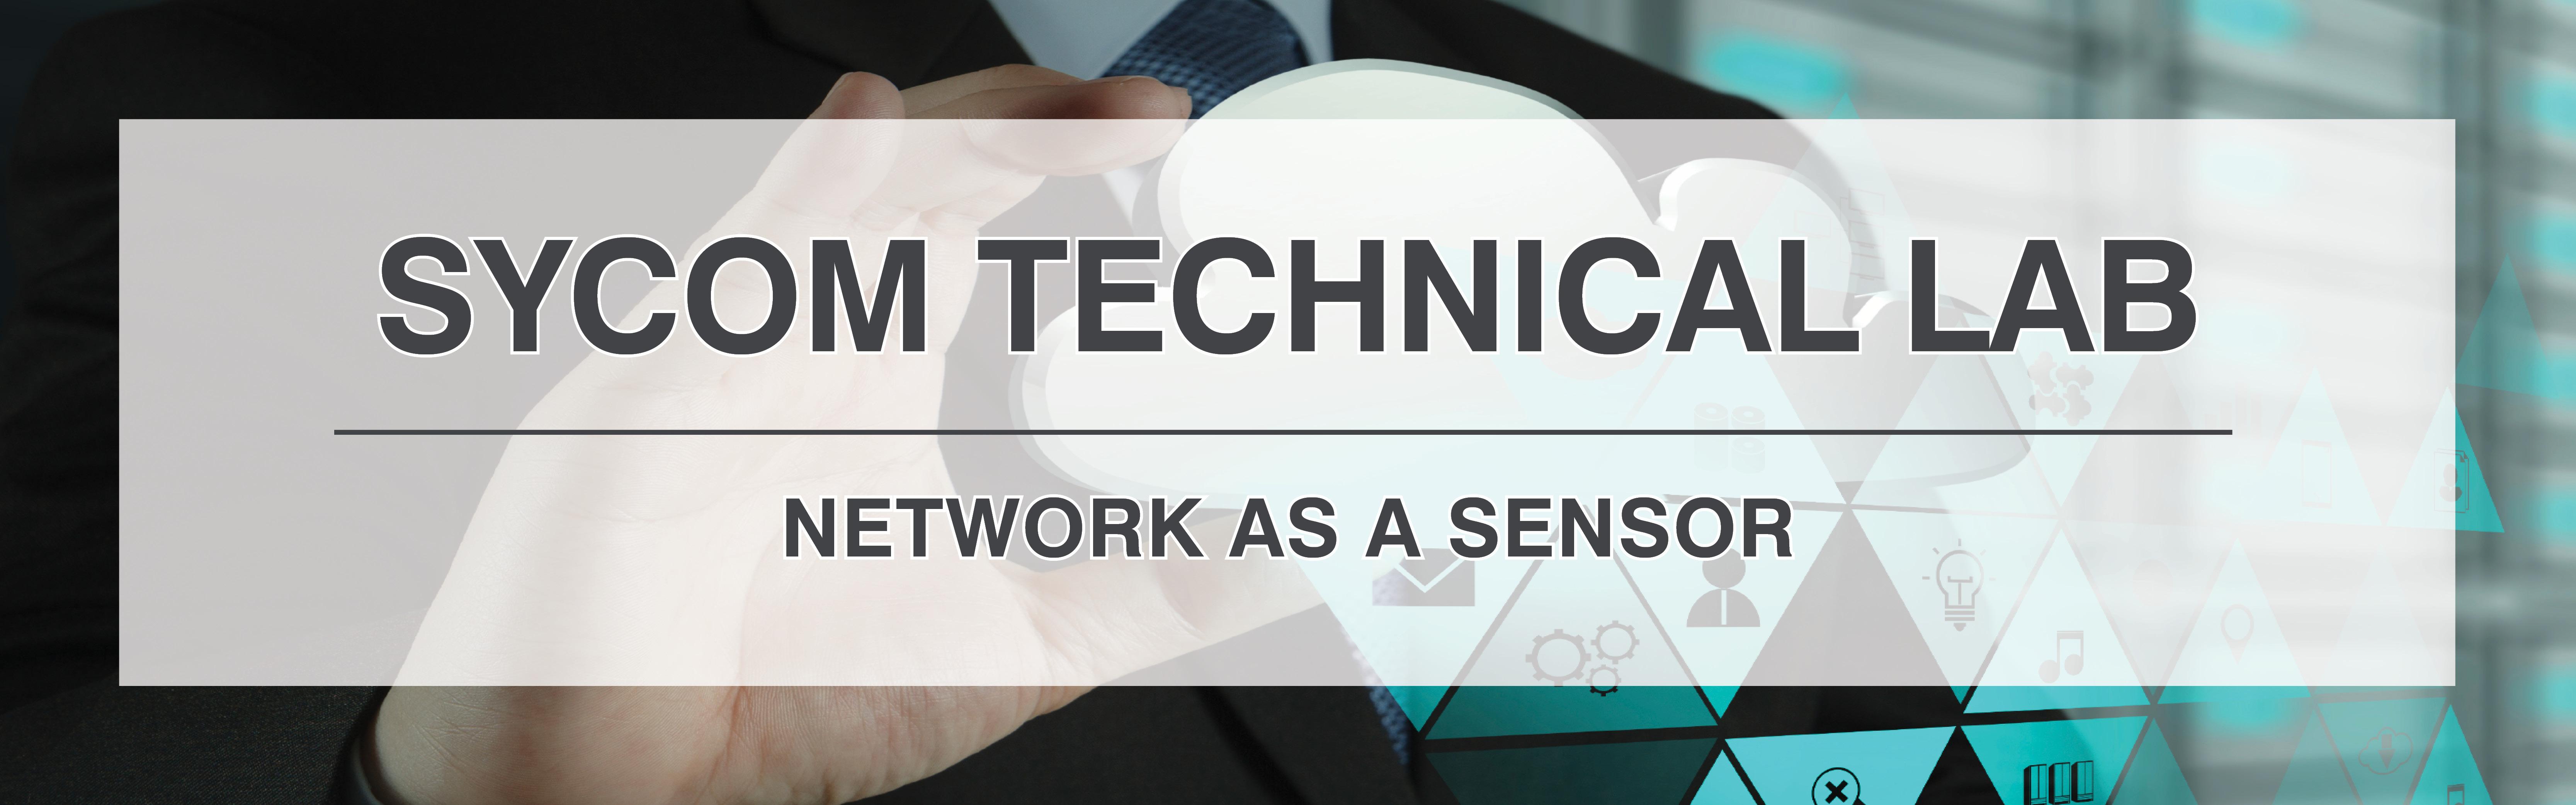 SyCom Technical Lab: 'Network as a Sensor'